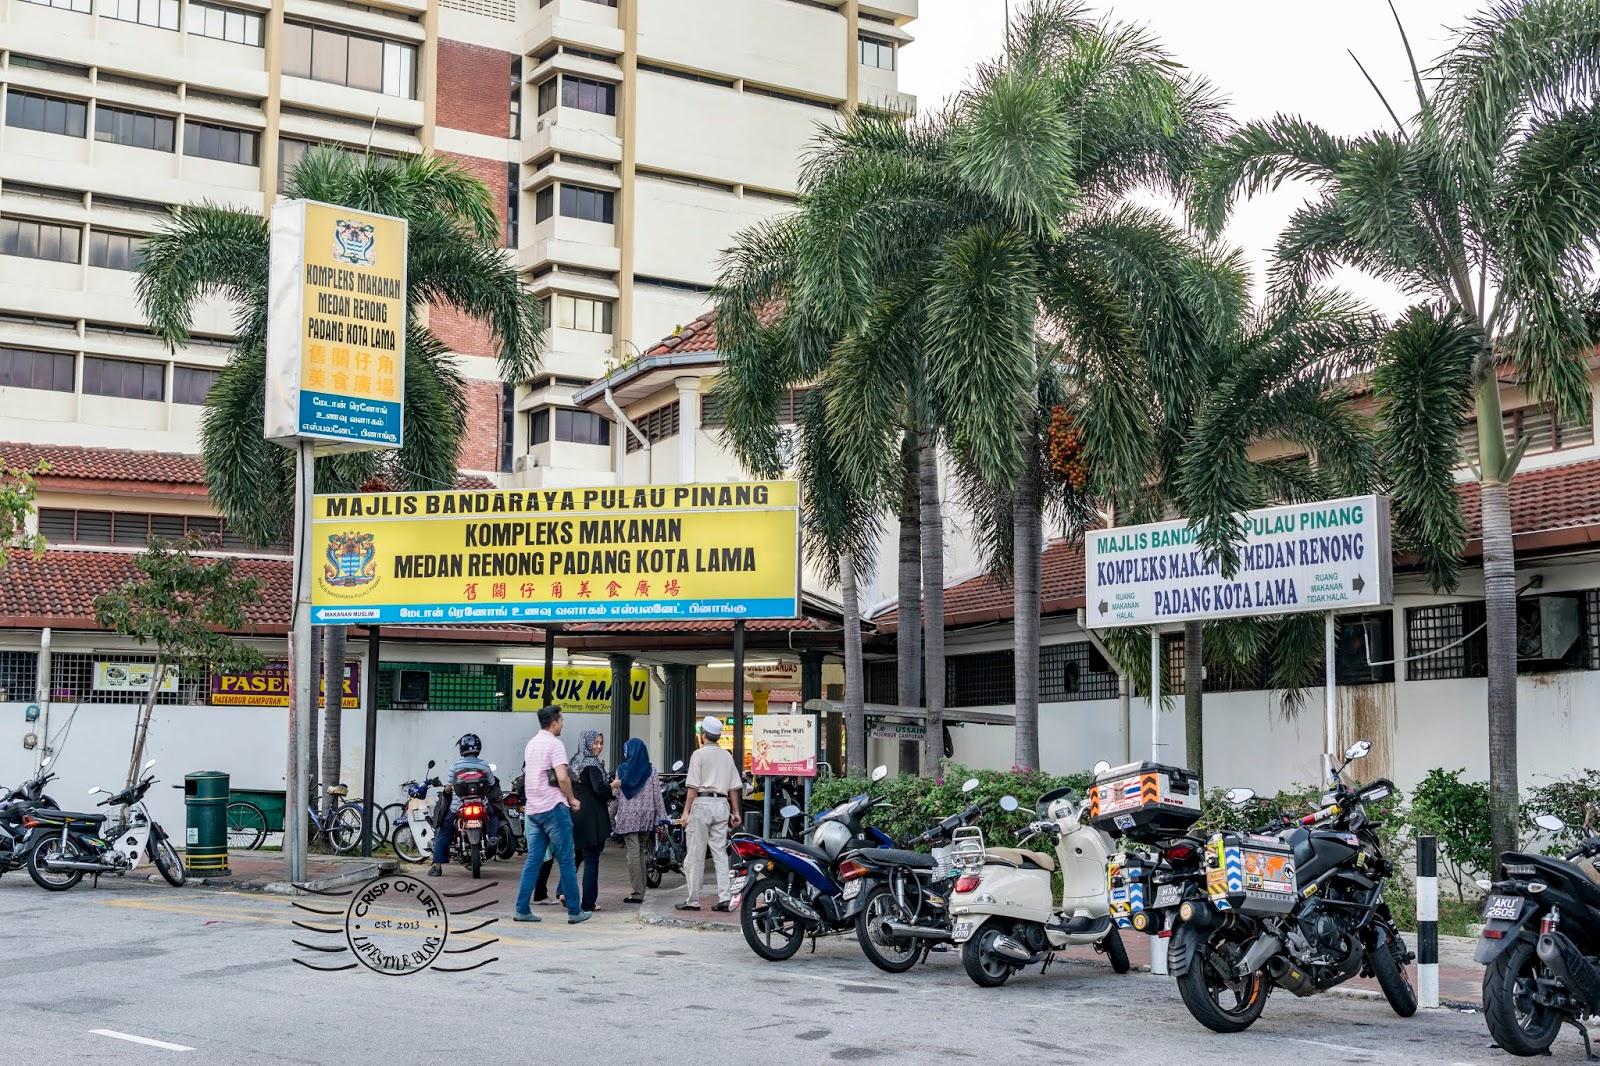 Kompleks Makanan Medan Renong Padang Kota Lama @ Esplanade, Penang